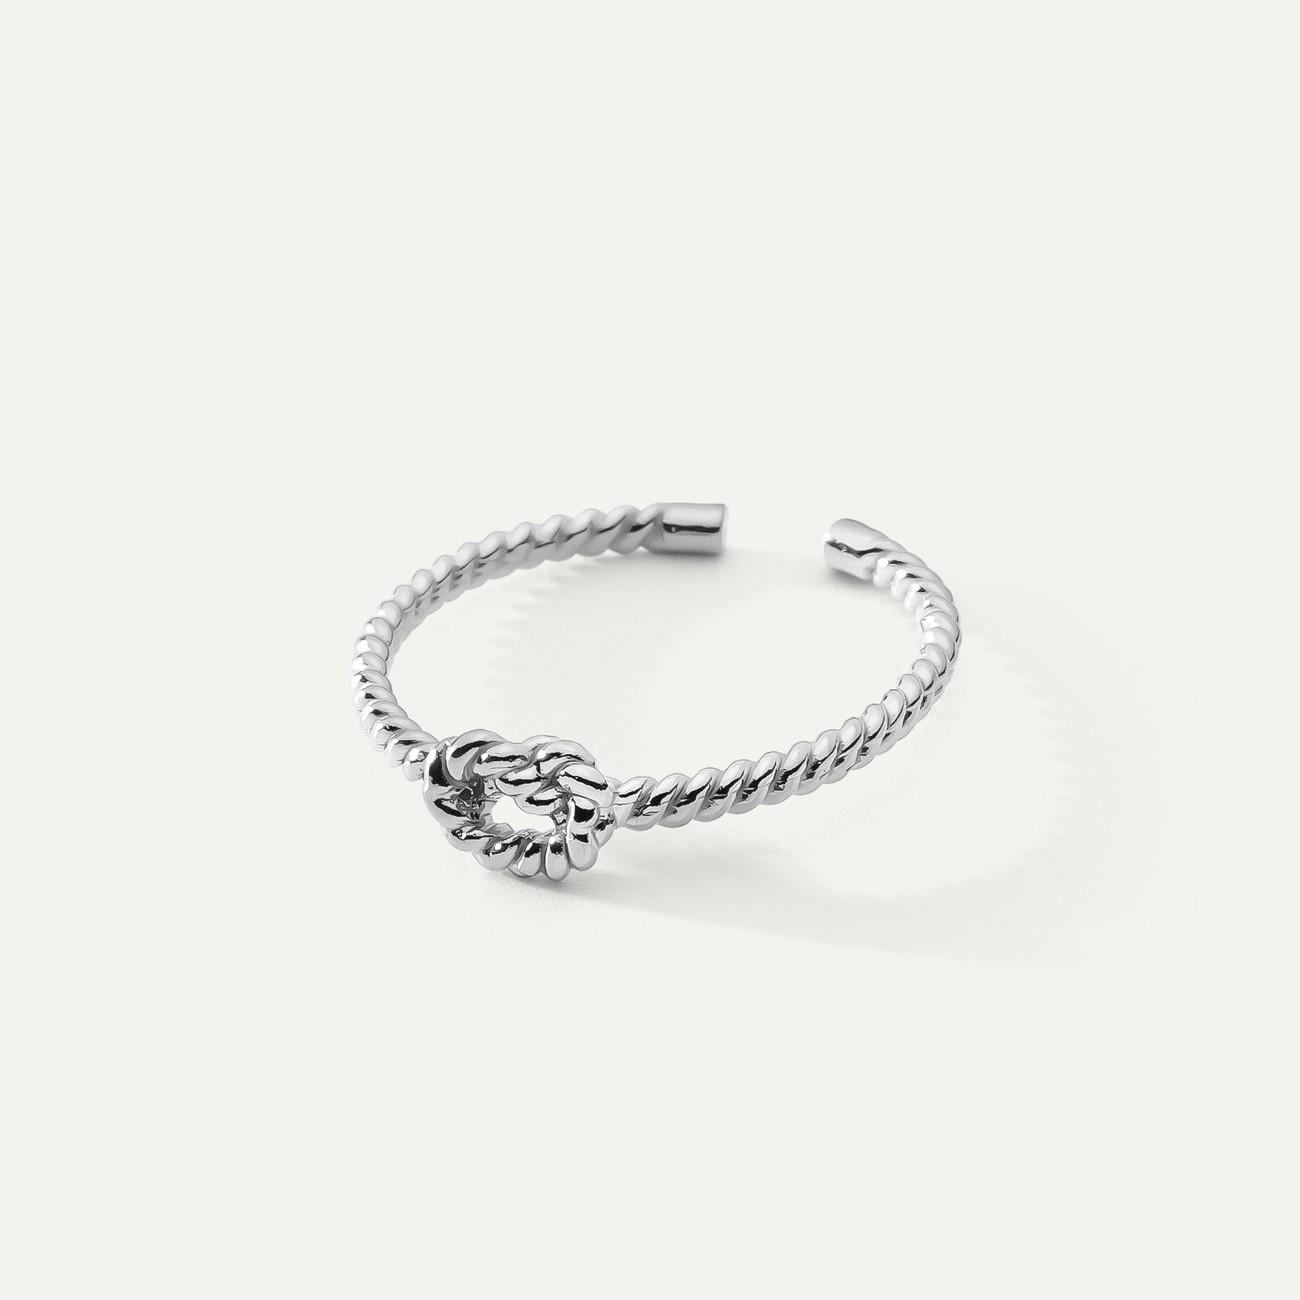 Srebrny pierścionek supeł z liny, sznurek, srebro 925